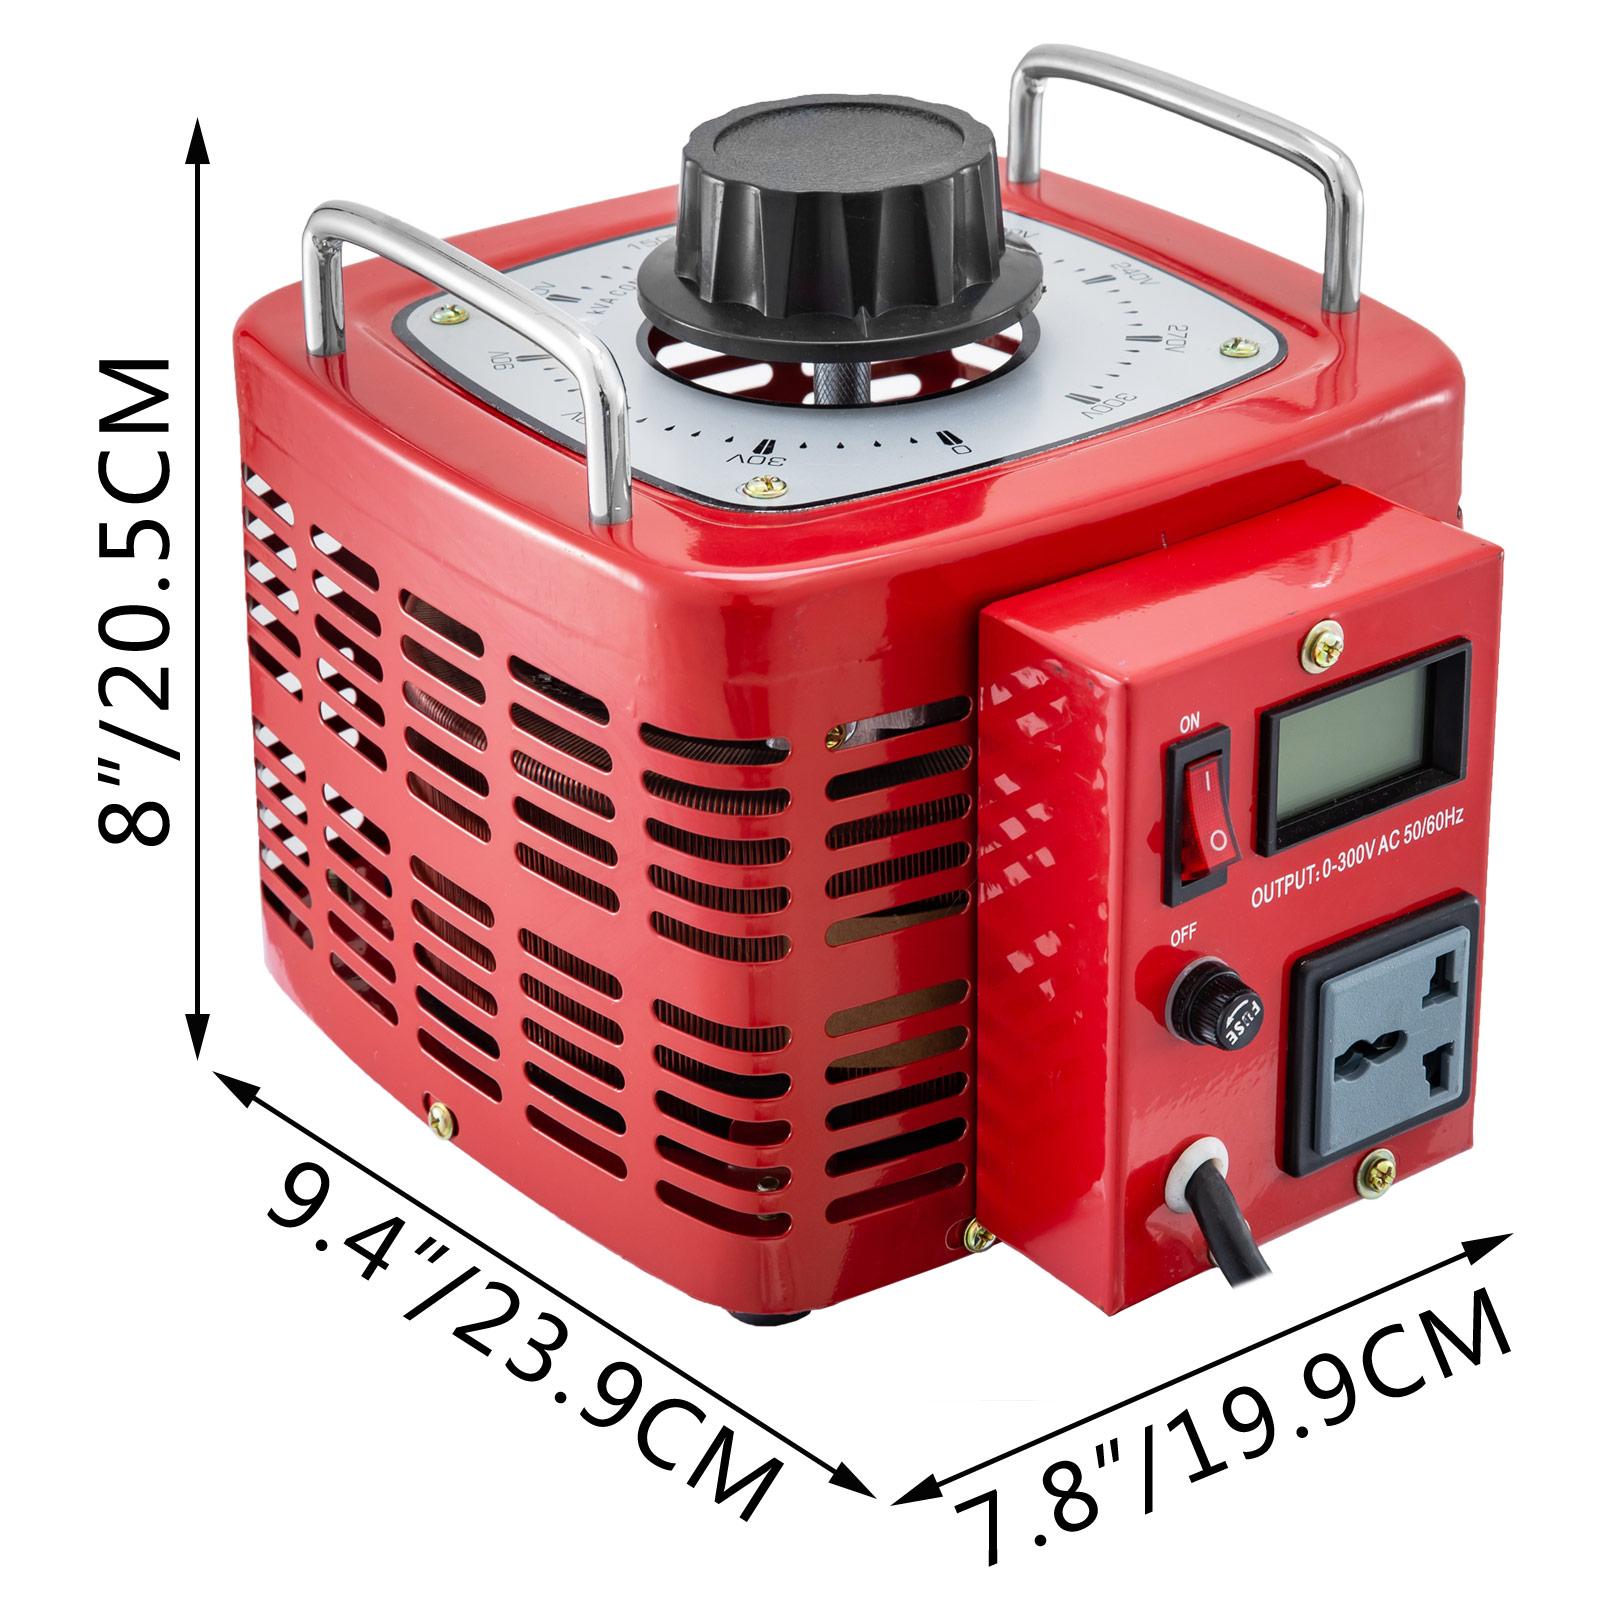 Auto-Variac-Variable-Transformer-0-5-1-2-3KVA-Regulator-pure-copper-coil-220V thumbnail 68